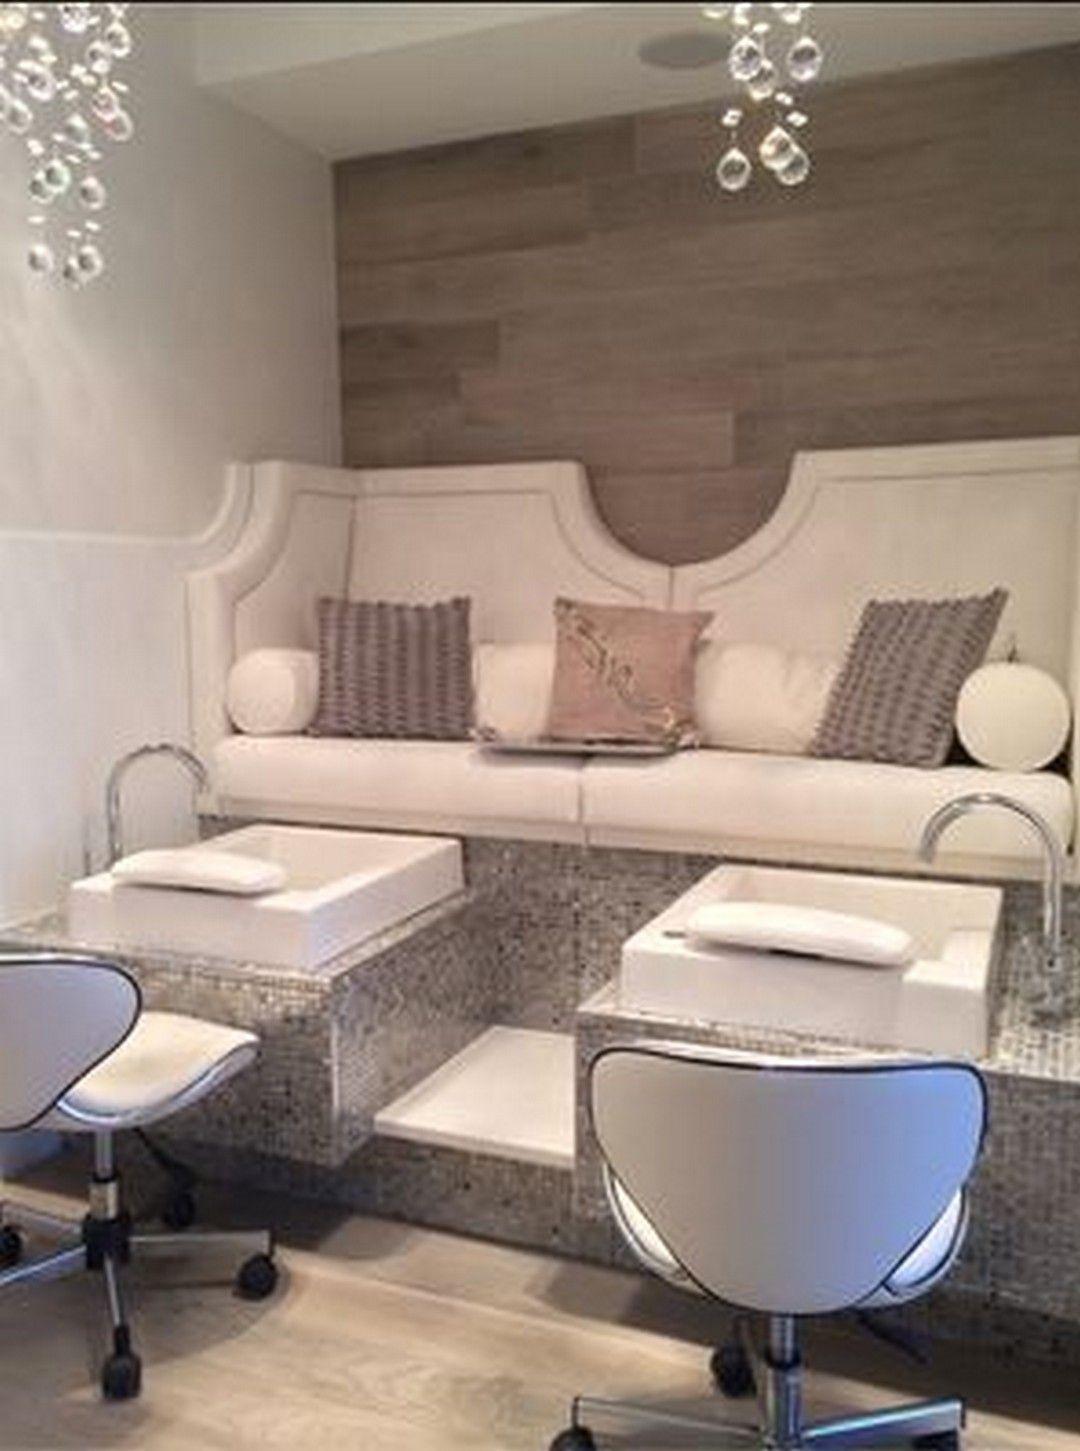 37 Excellent Indoor Spa Decorating Ideas Https Www Onechitecture Com 2018 03 03 37 Excellent Indoor Sp Pedicure Salon Salon Interior Design Nail Salon Design